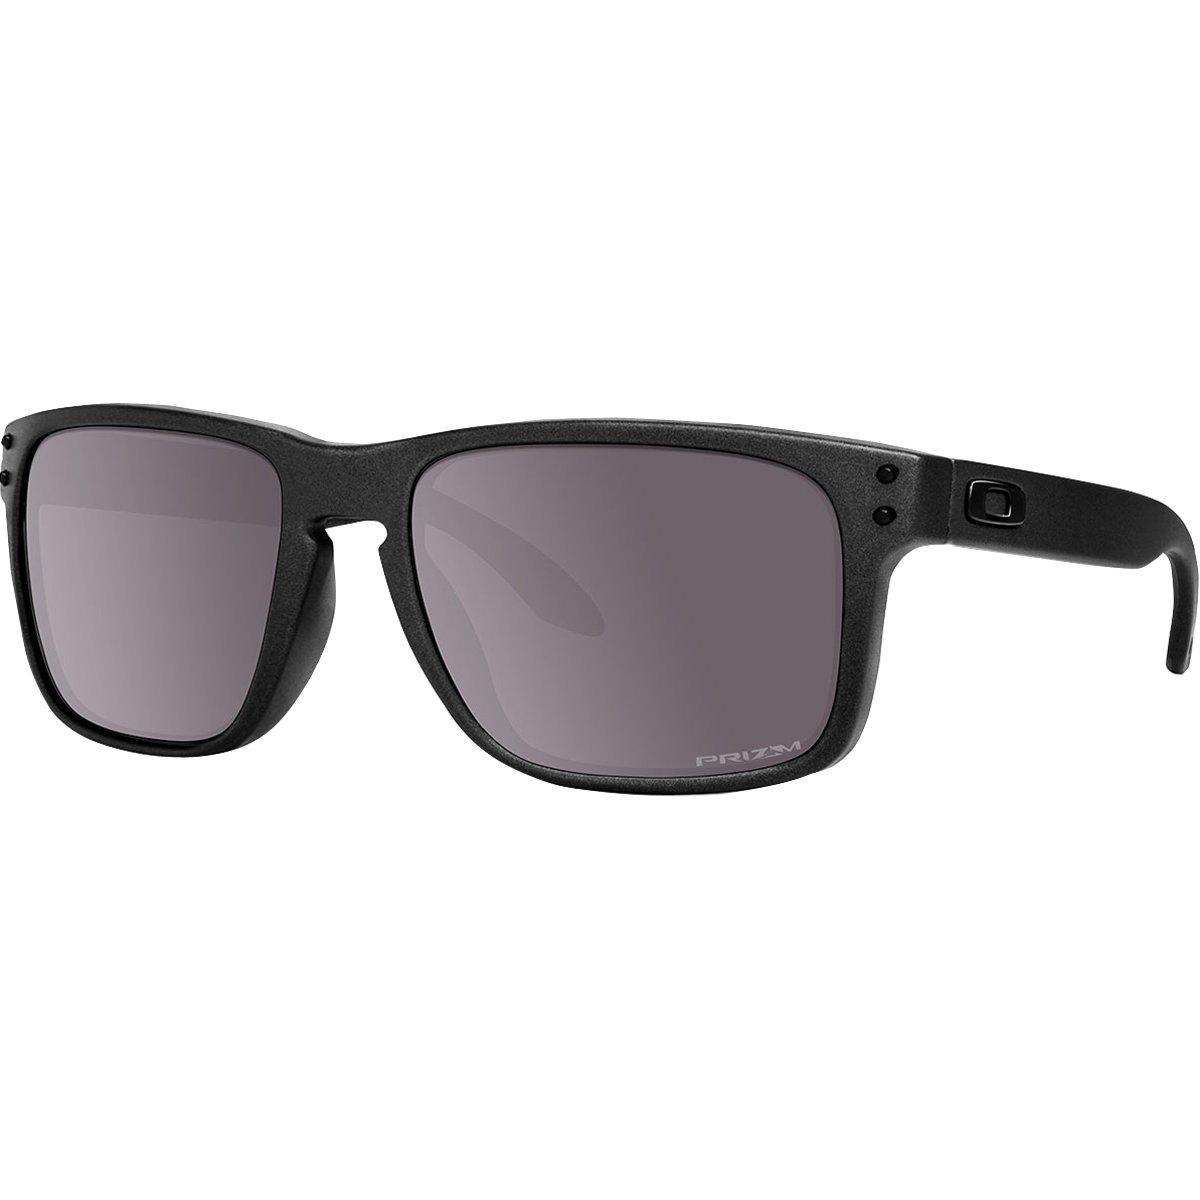 Oakley Men's Holbrook Sunglass, Steel/Prizm Daily Polarized